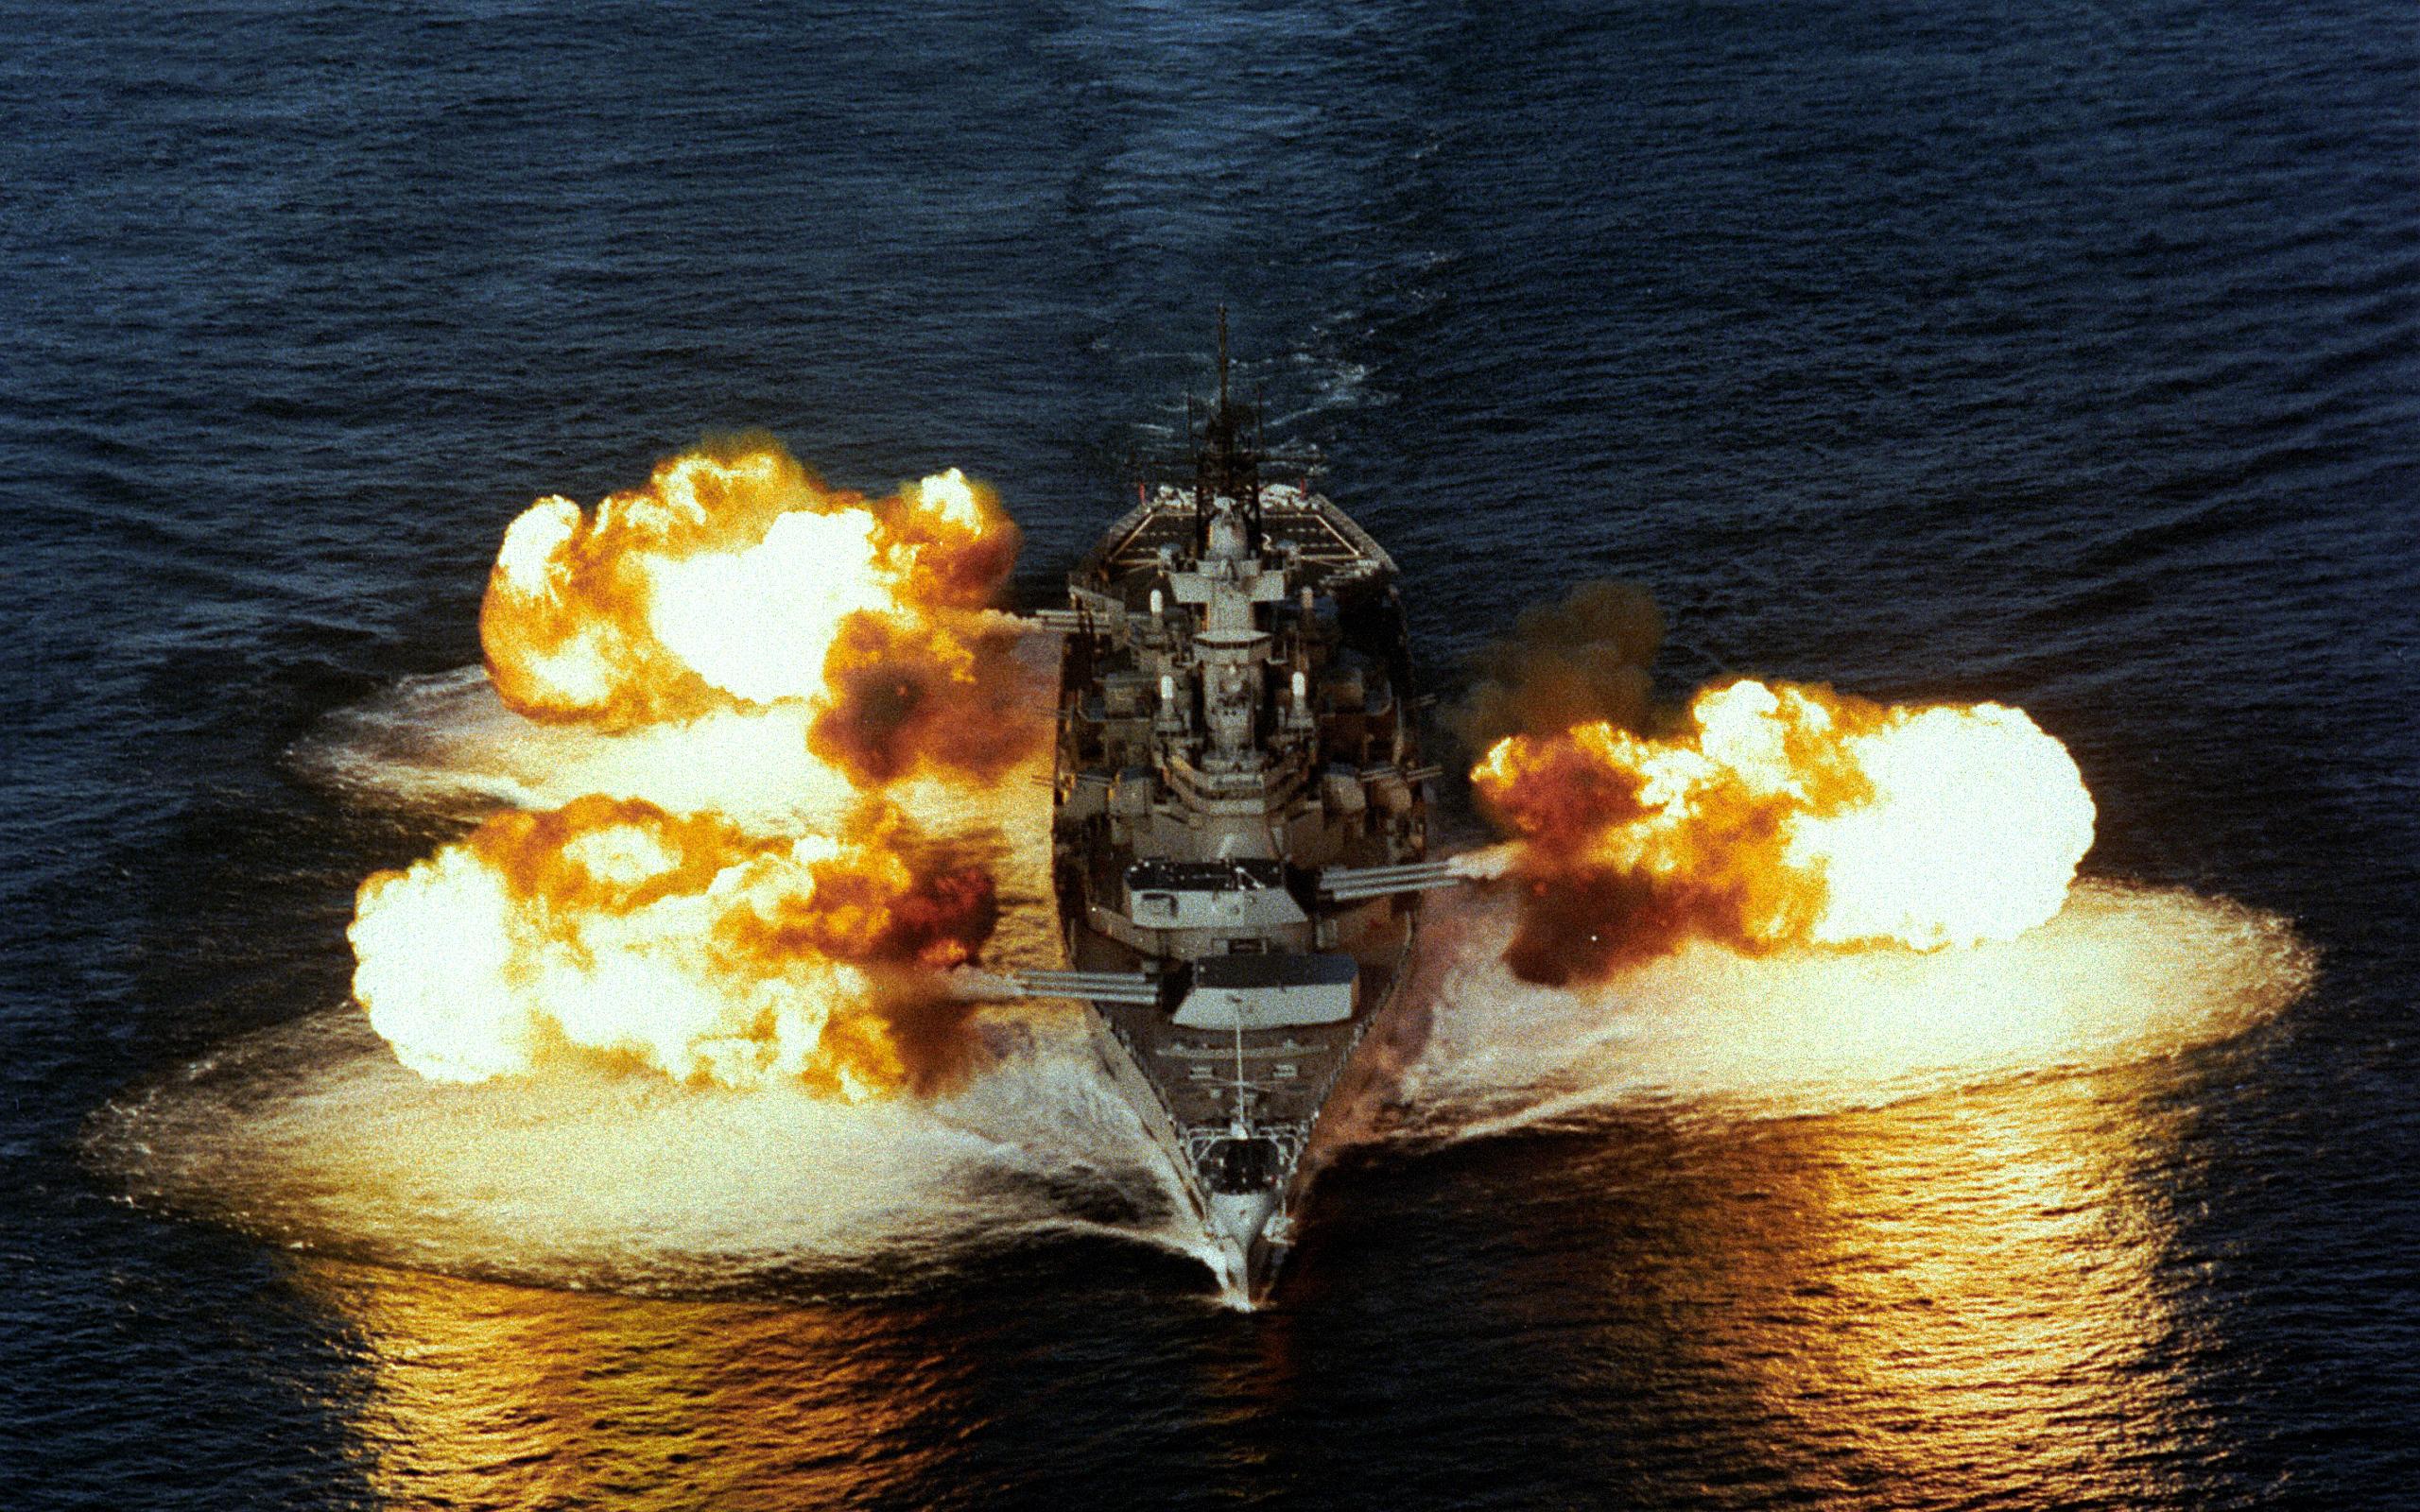 Battleship Broadside Wallpaper 2560x1600 Battleship Broadside 2560x1600